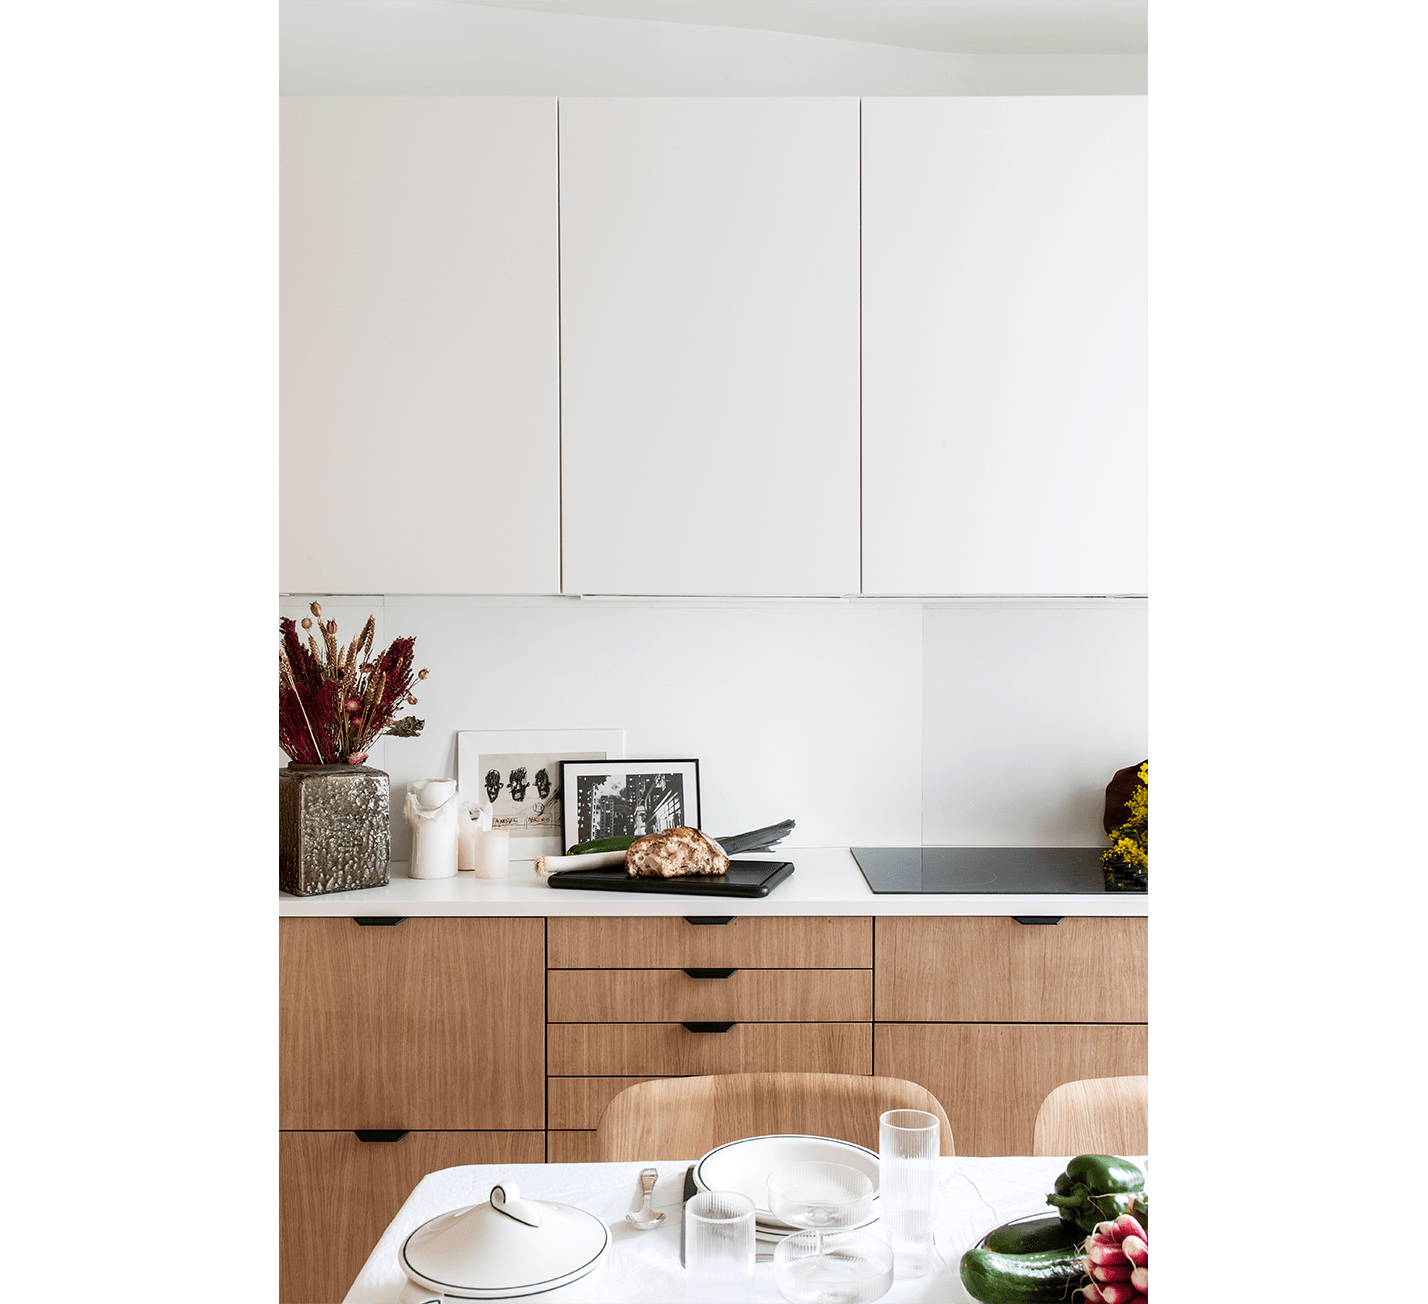 Projet-Cavallotti-Atelier-Steve-Pauline-Borgia-Architecte-interieur-06-min